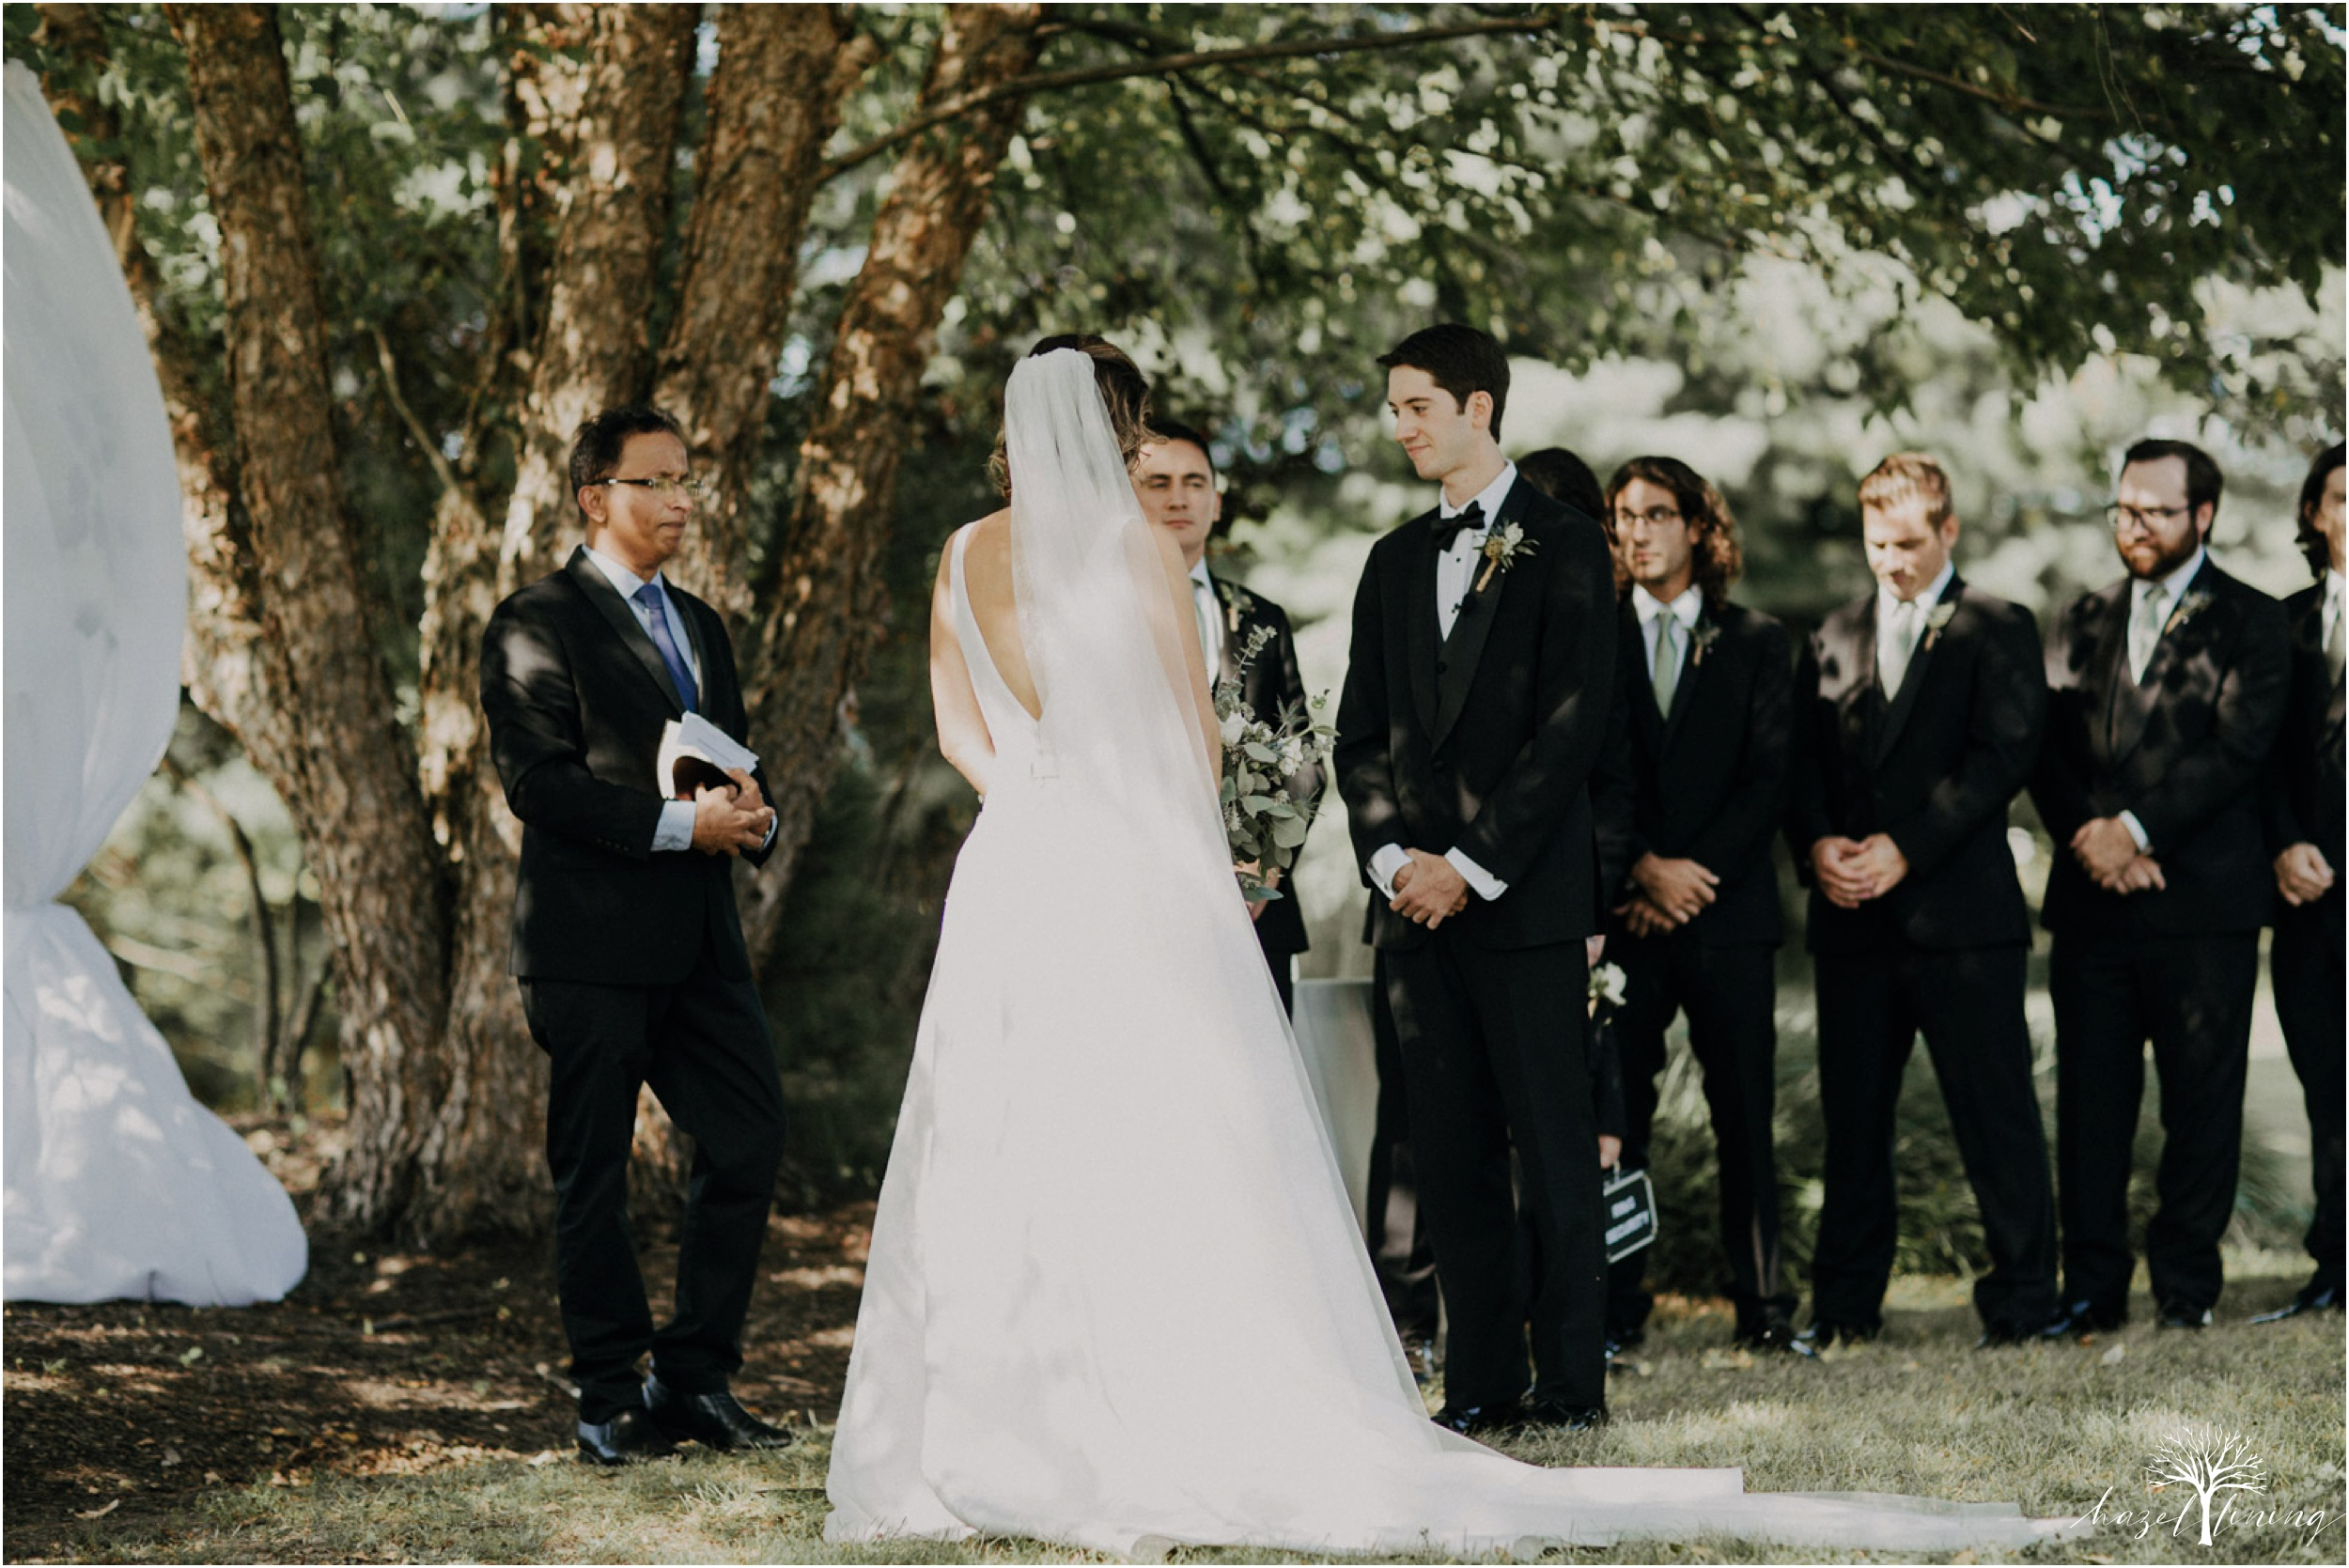 maureen-hepner-anthony-giordano-rose-bank-winery-newtow-pennsylvania-luxury-summer-wedding-hazel-lining-photography-destination-elopement-wedding-engagement-photography_0064.jpg